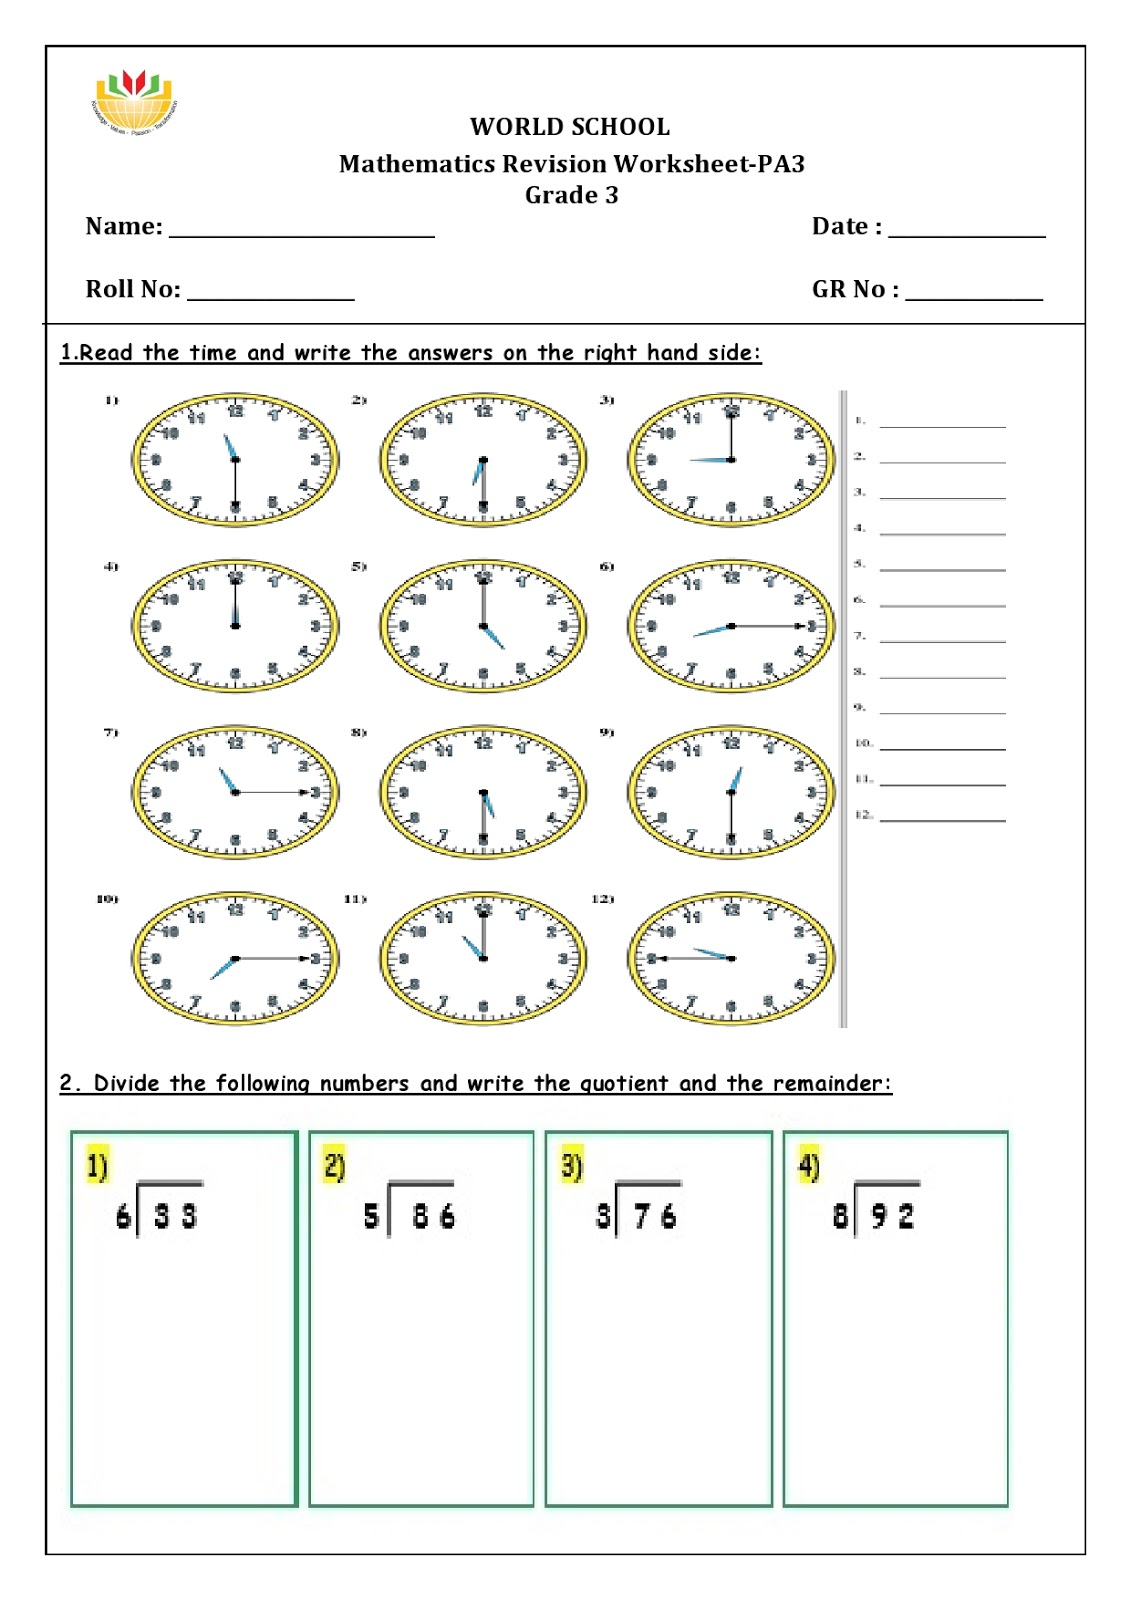 Birla World School Oman Homework For Grade 3 As On 28 01